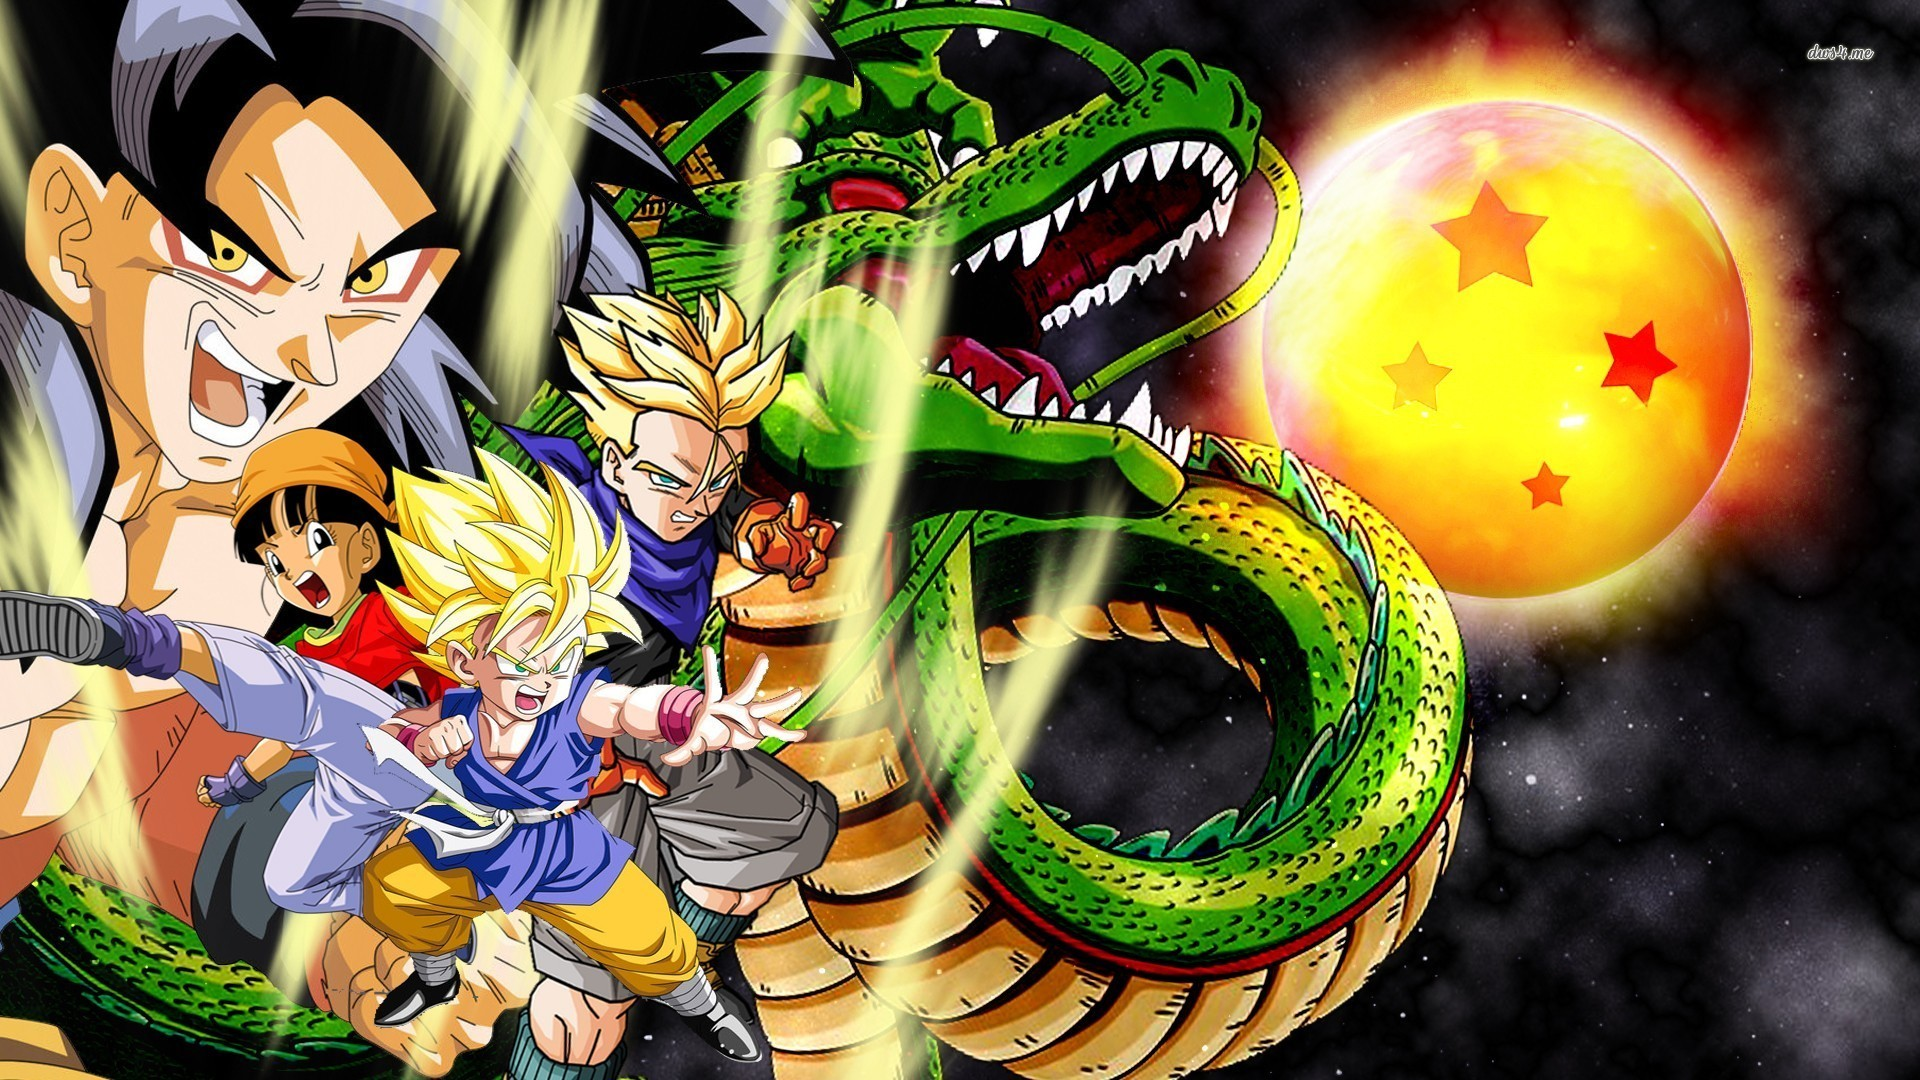 Dragon Ball Gt HD Wallpapers ·① WallpaperTag